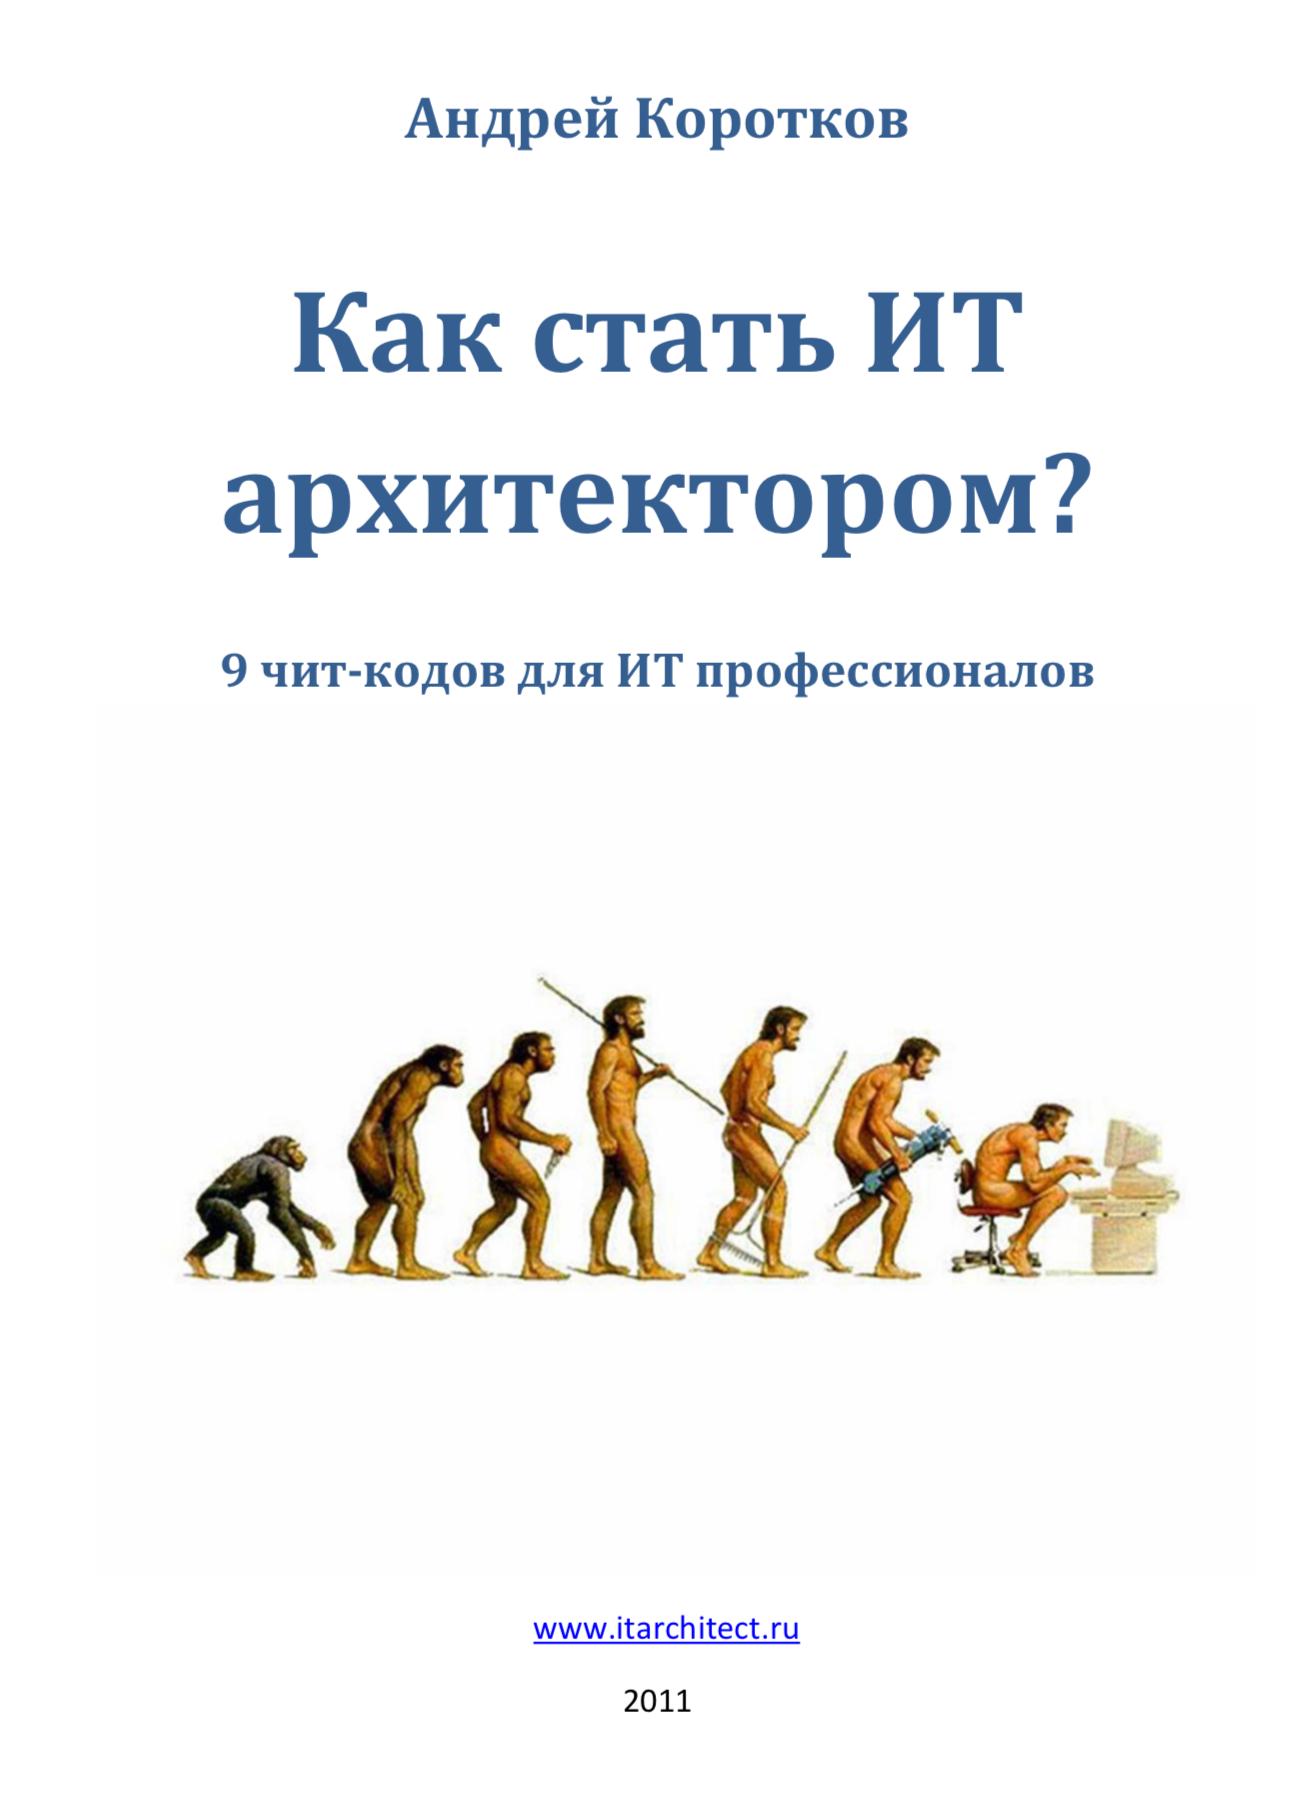 Книга 2011 года.